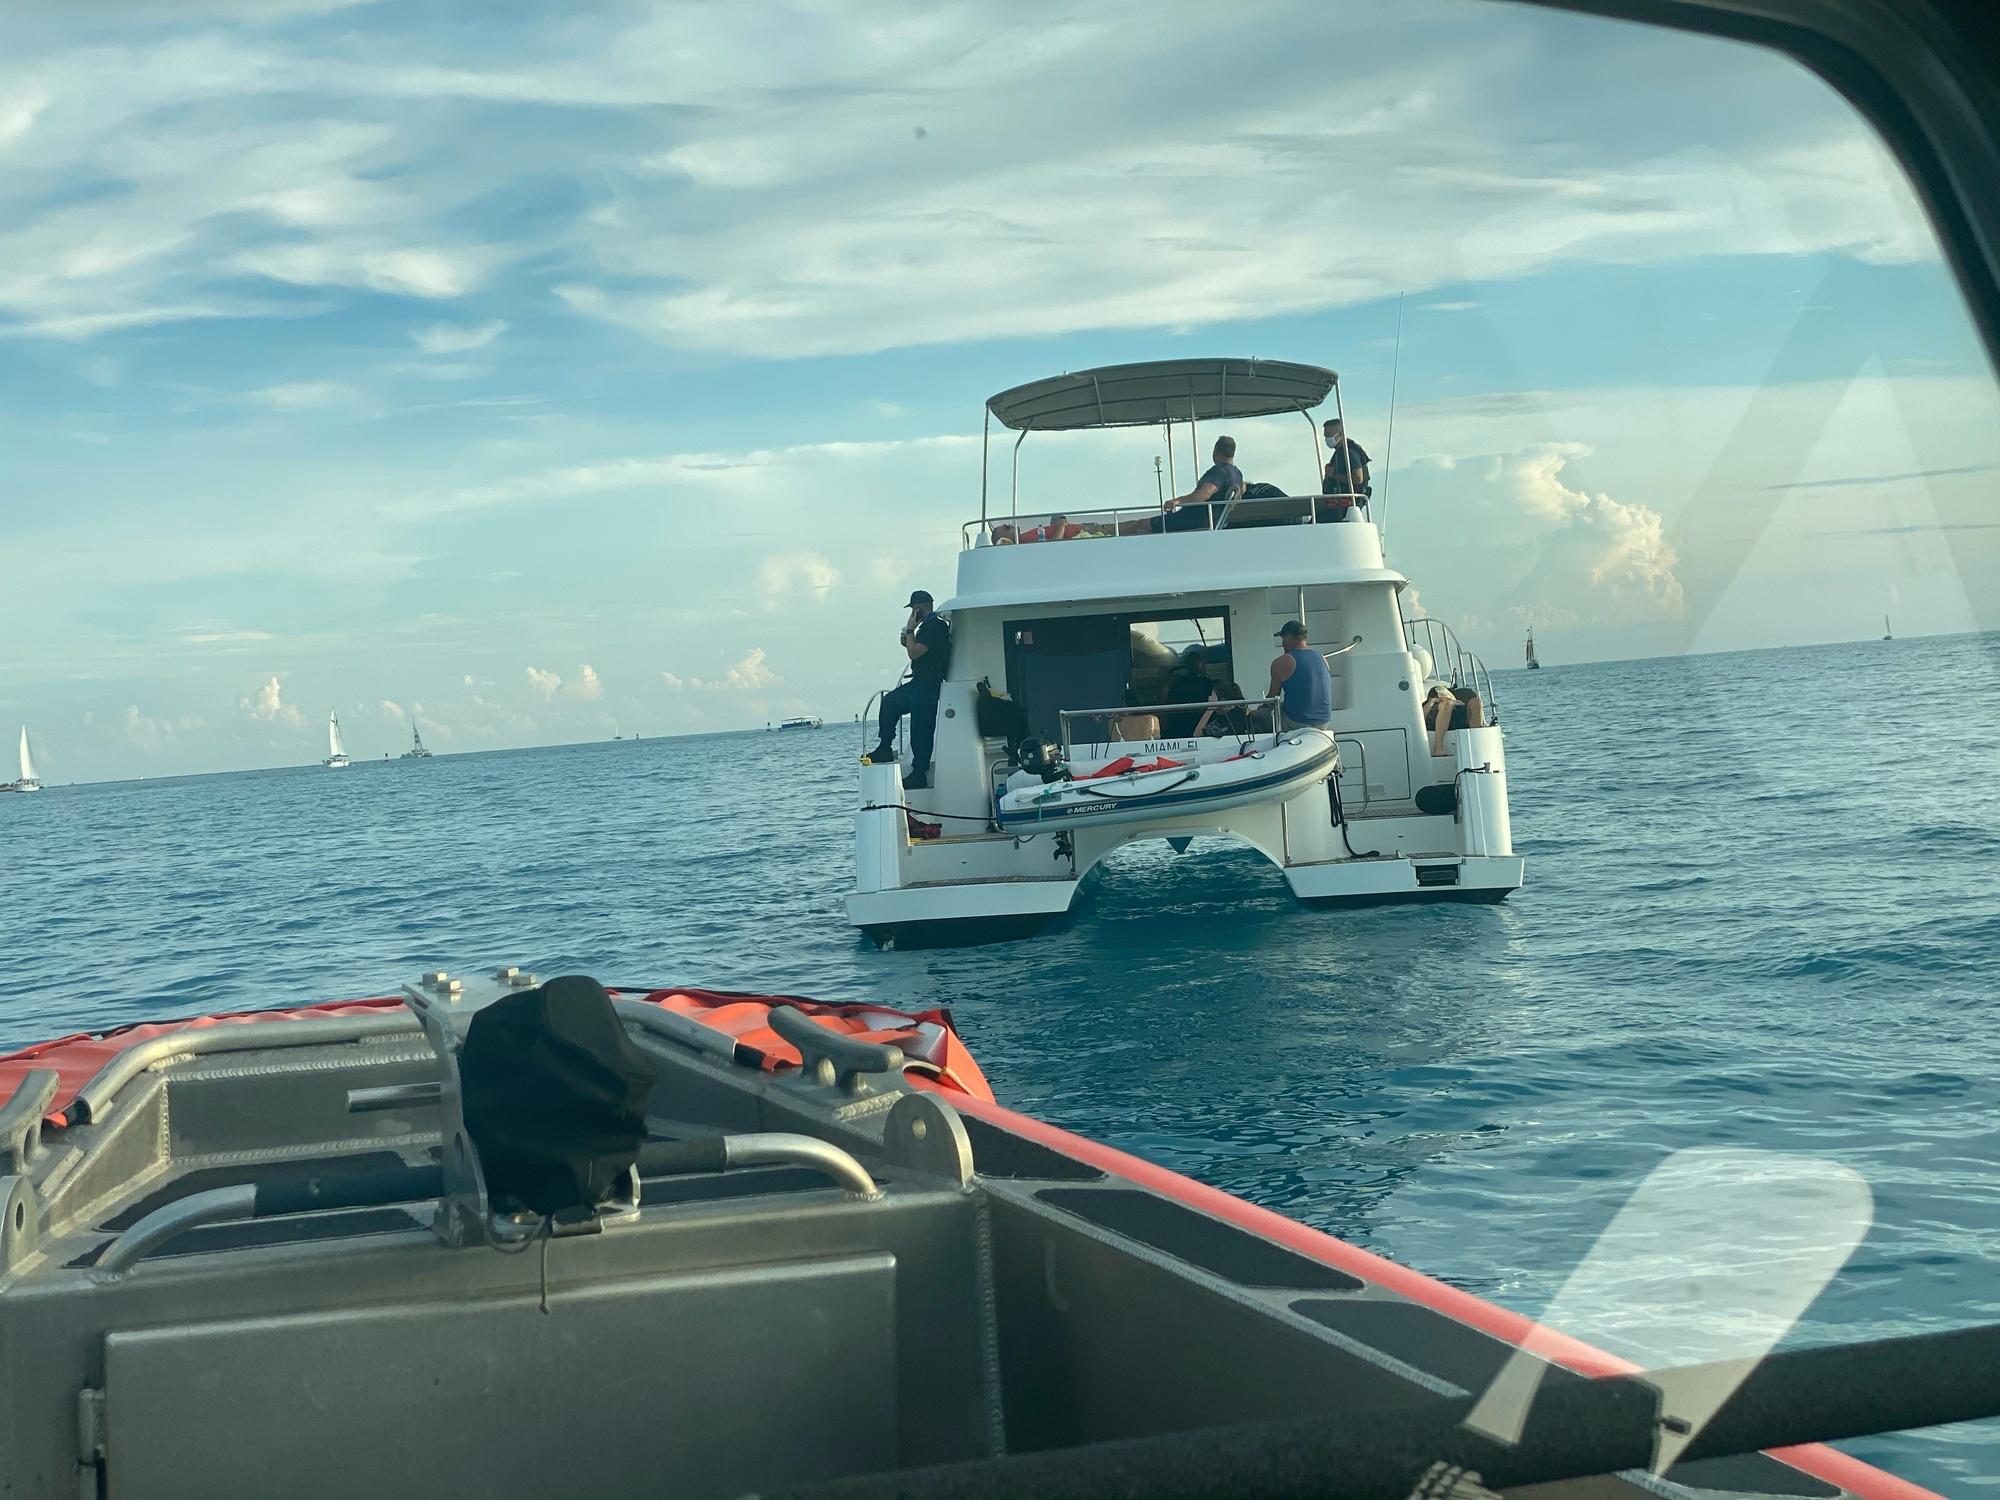 Coast Guard halts illegal charter near Sunset Key